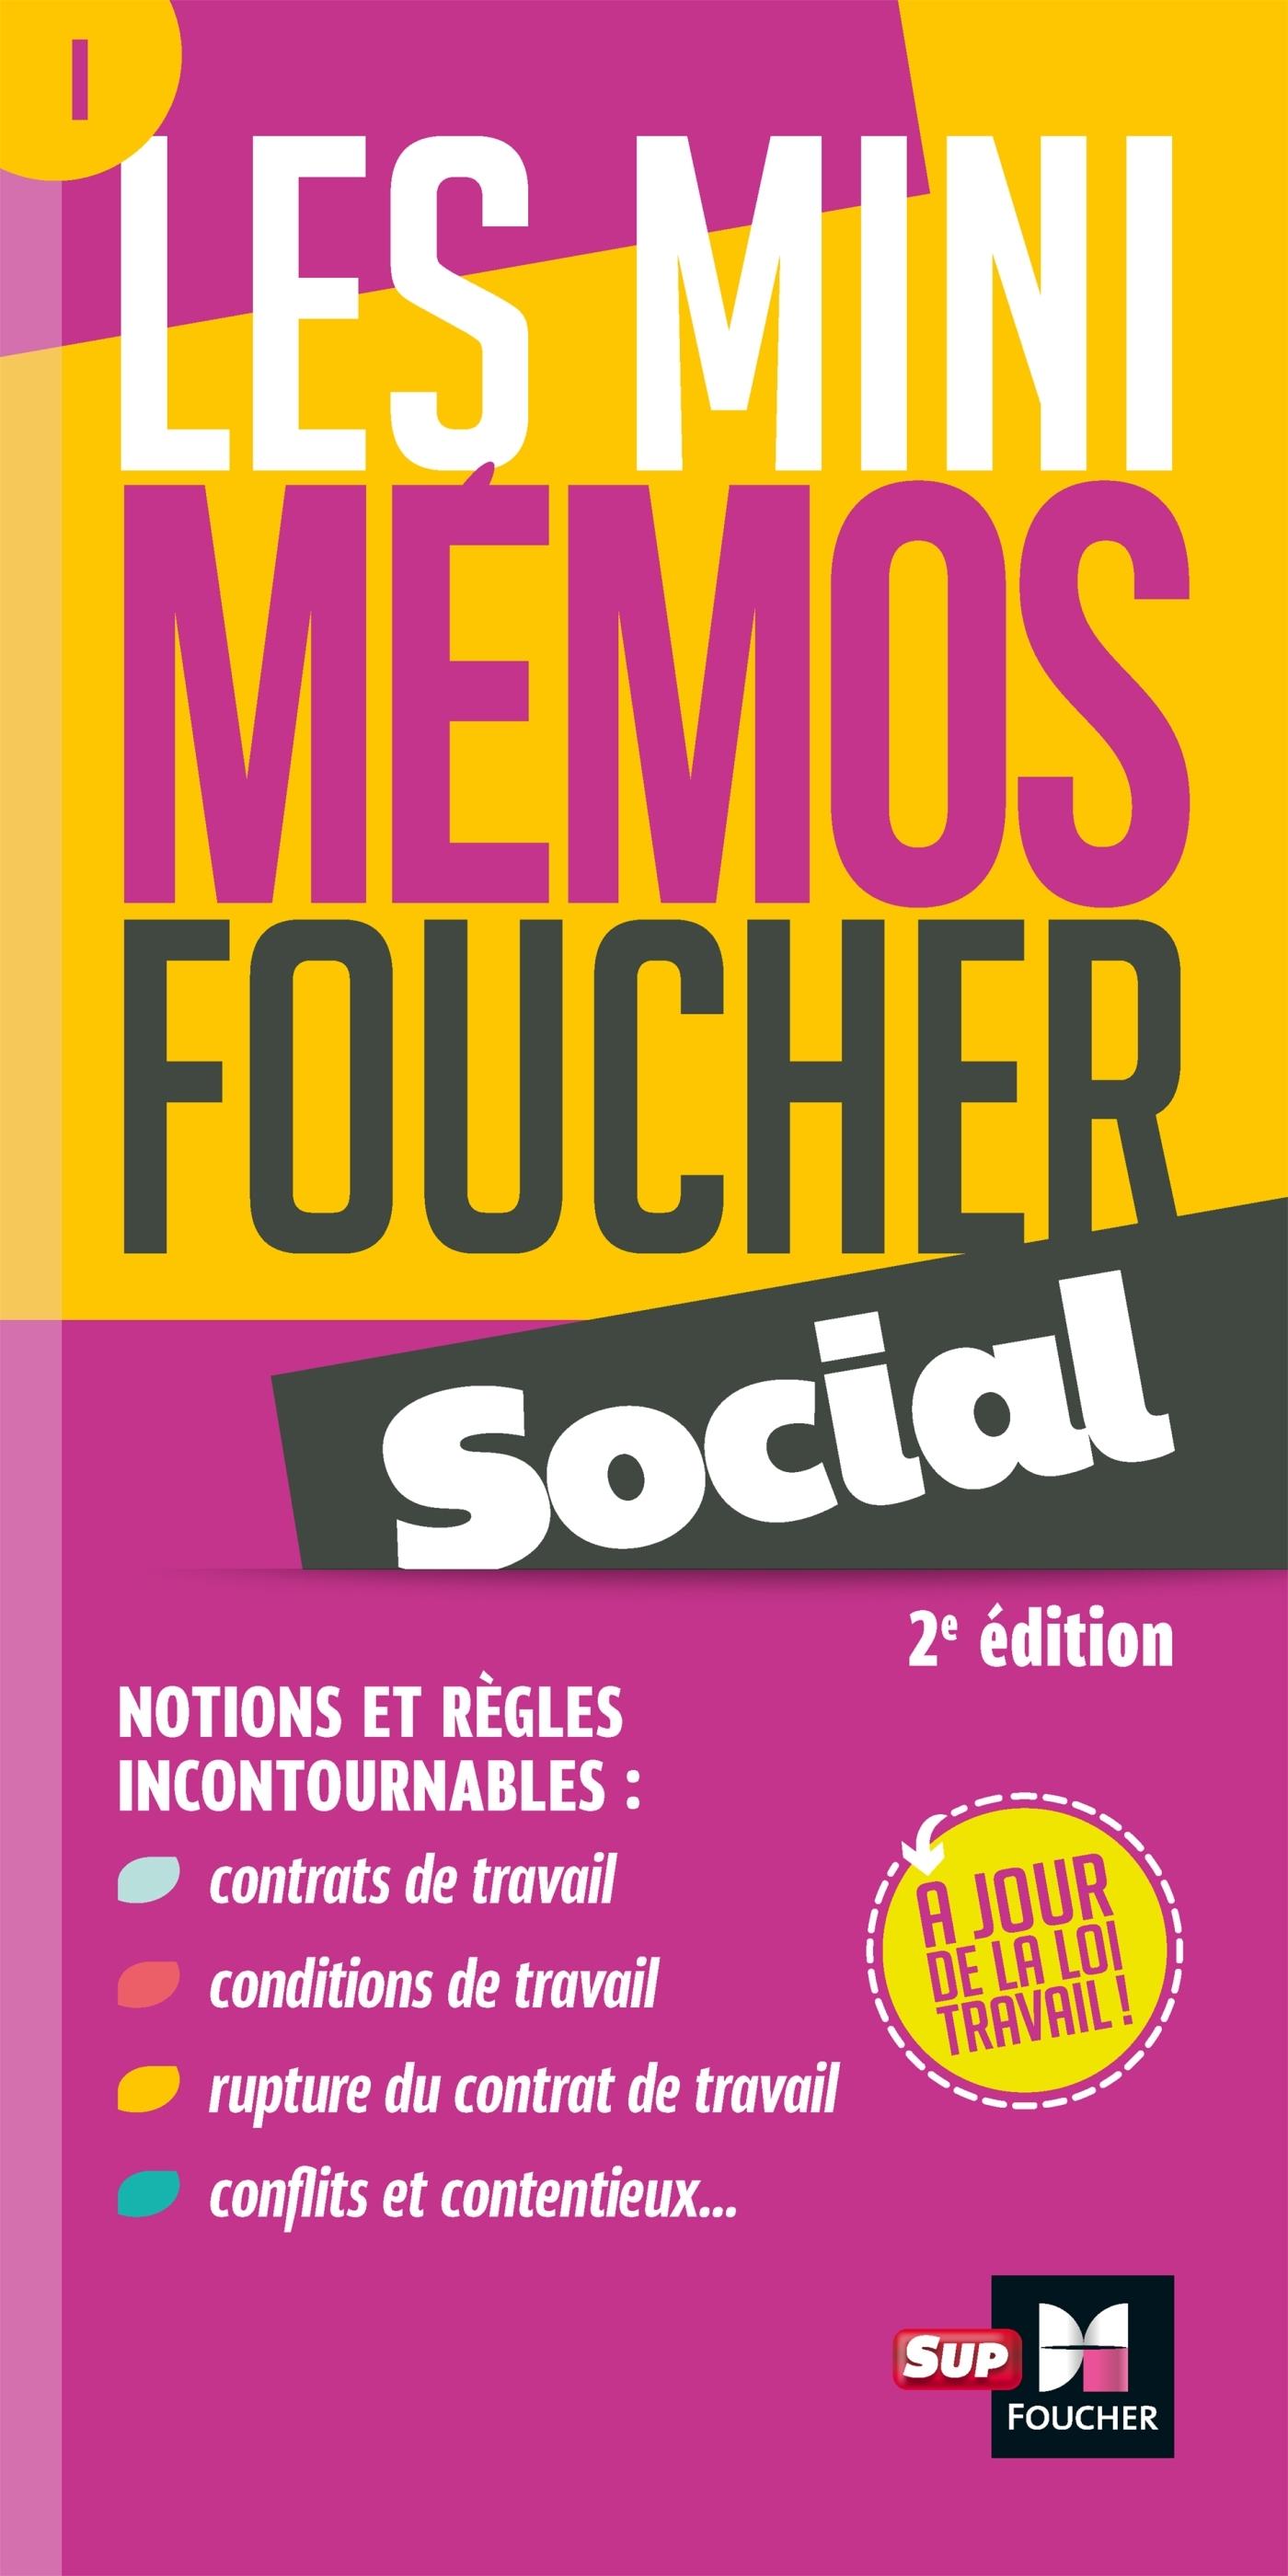 LES MINI MEMOS FOUCHER -  SOCIAL - 2E EDITION - REVISION